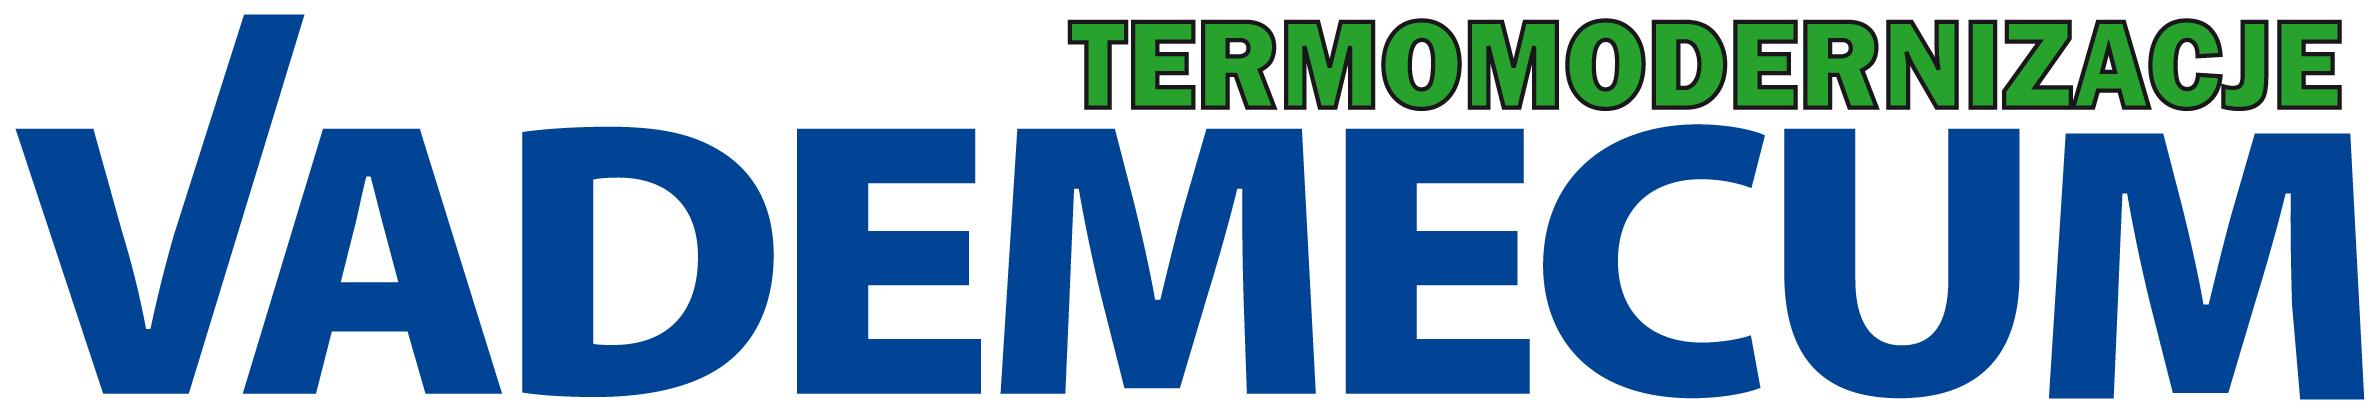 Vademecum termomodernizacje